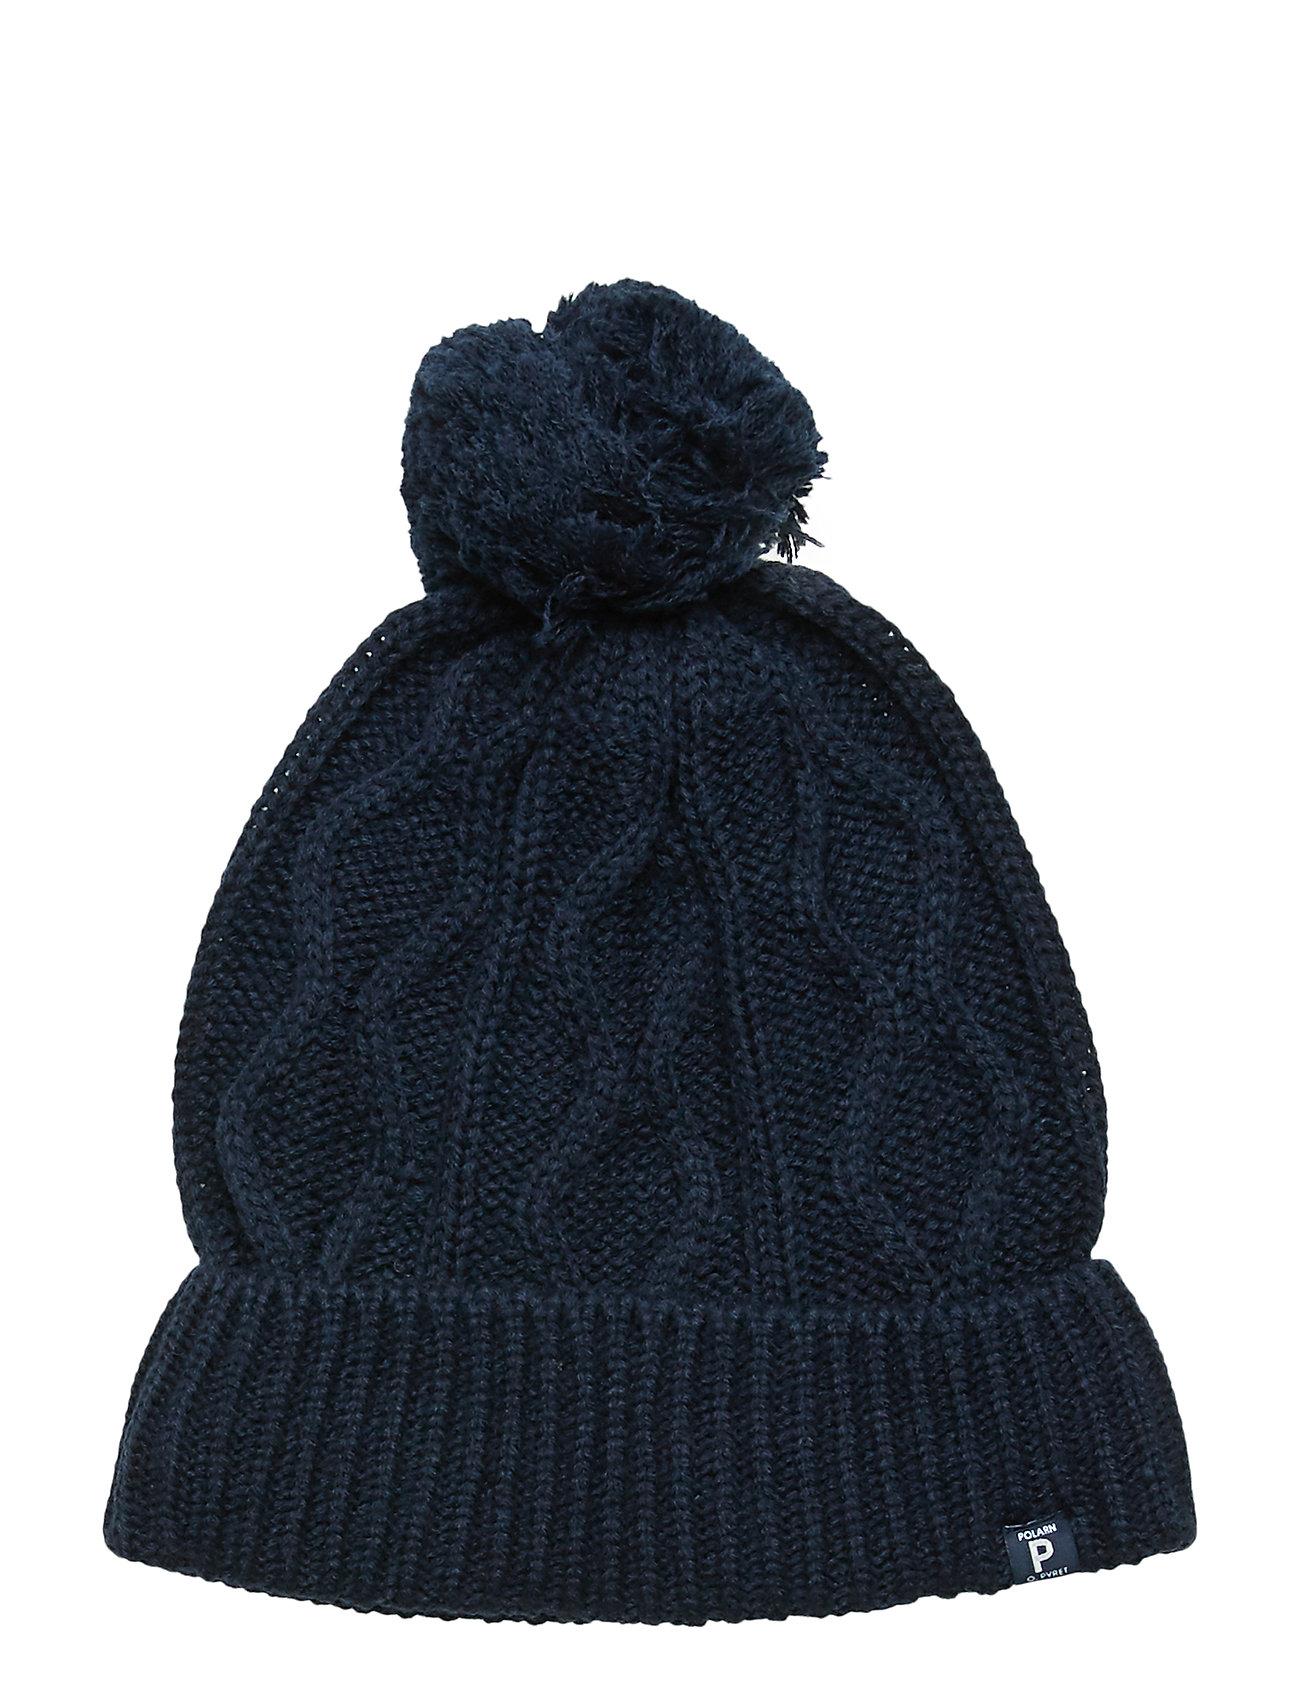 Polarn O. Pyret Cap Knitted Solid School - DARK SAPPHIRE